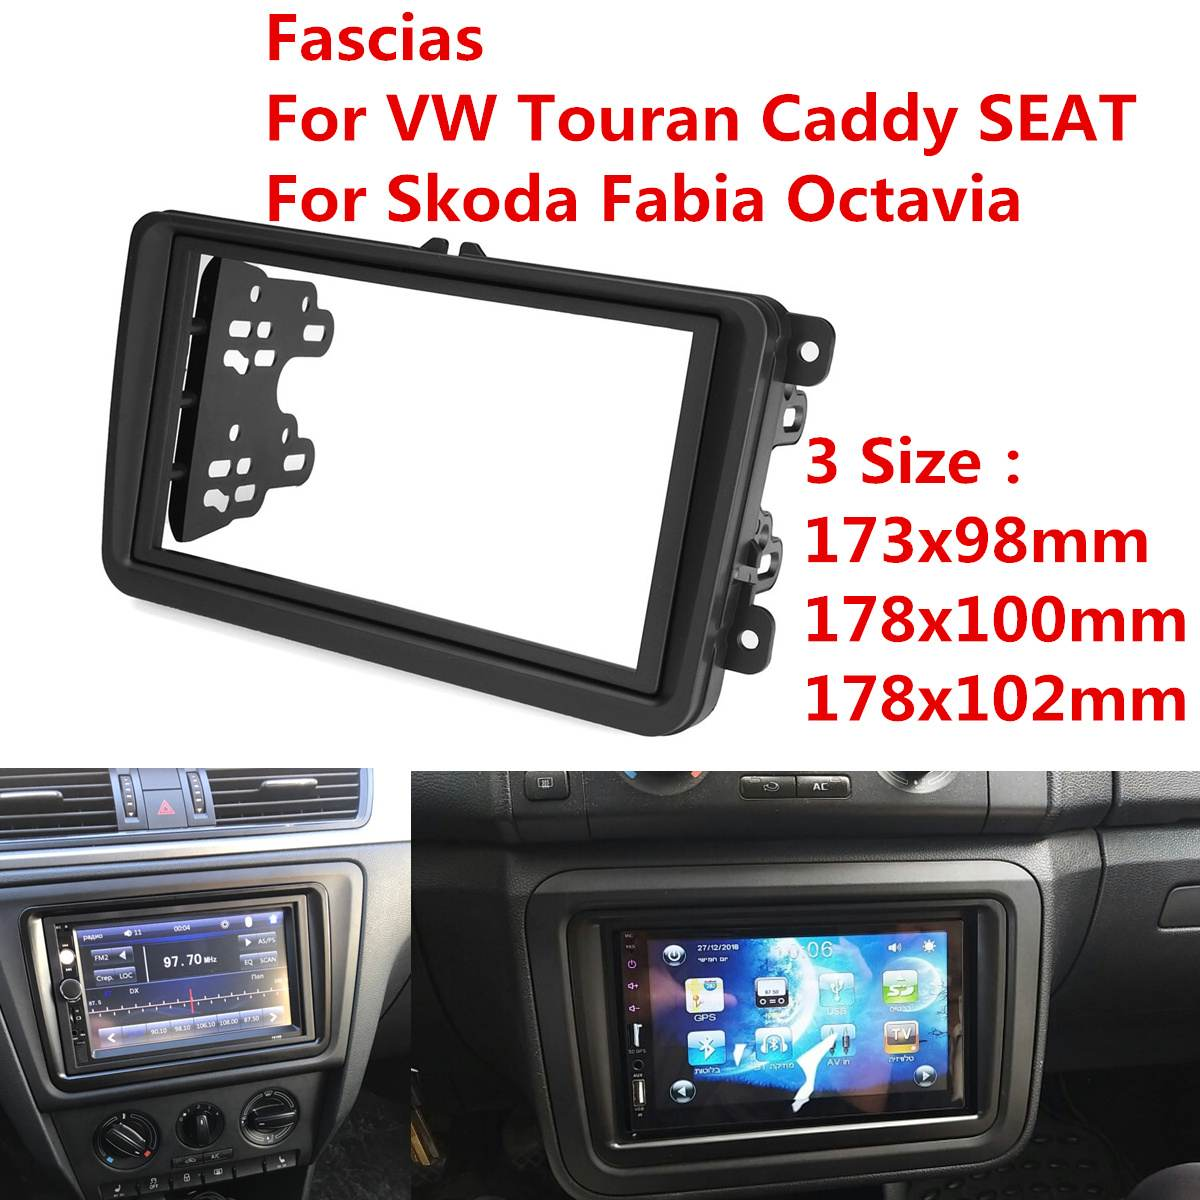 2 Din รถวิทยุ Fascias แผงกรอบ CD DVD Dash ภายในสำหรับ Volkswagen VW Touran แคดดี้ที่นั่ง Skoda fabia Octavia